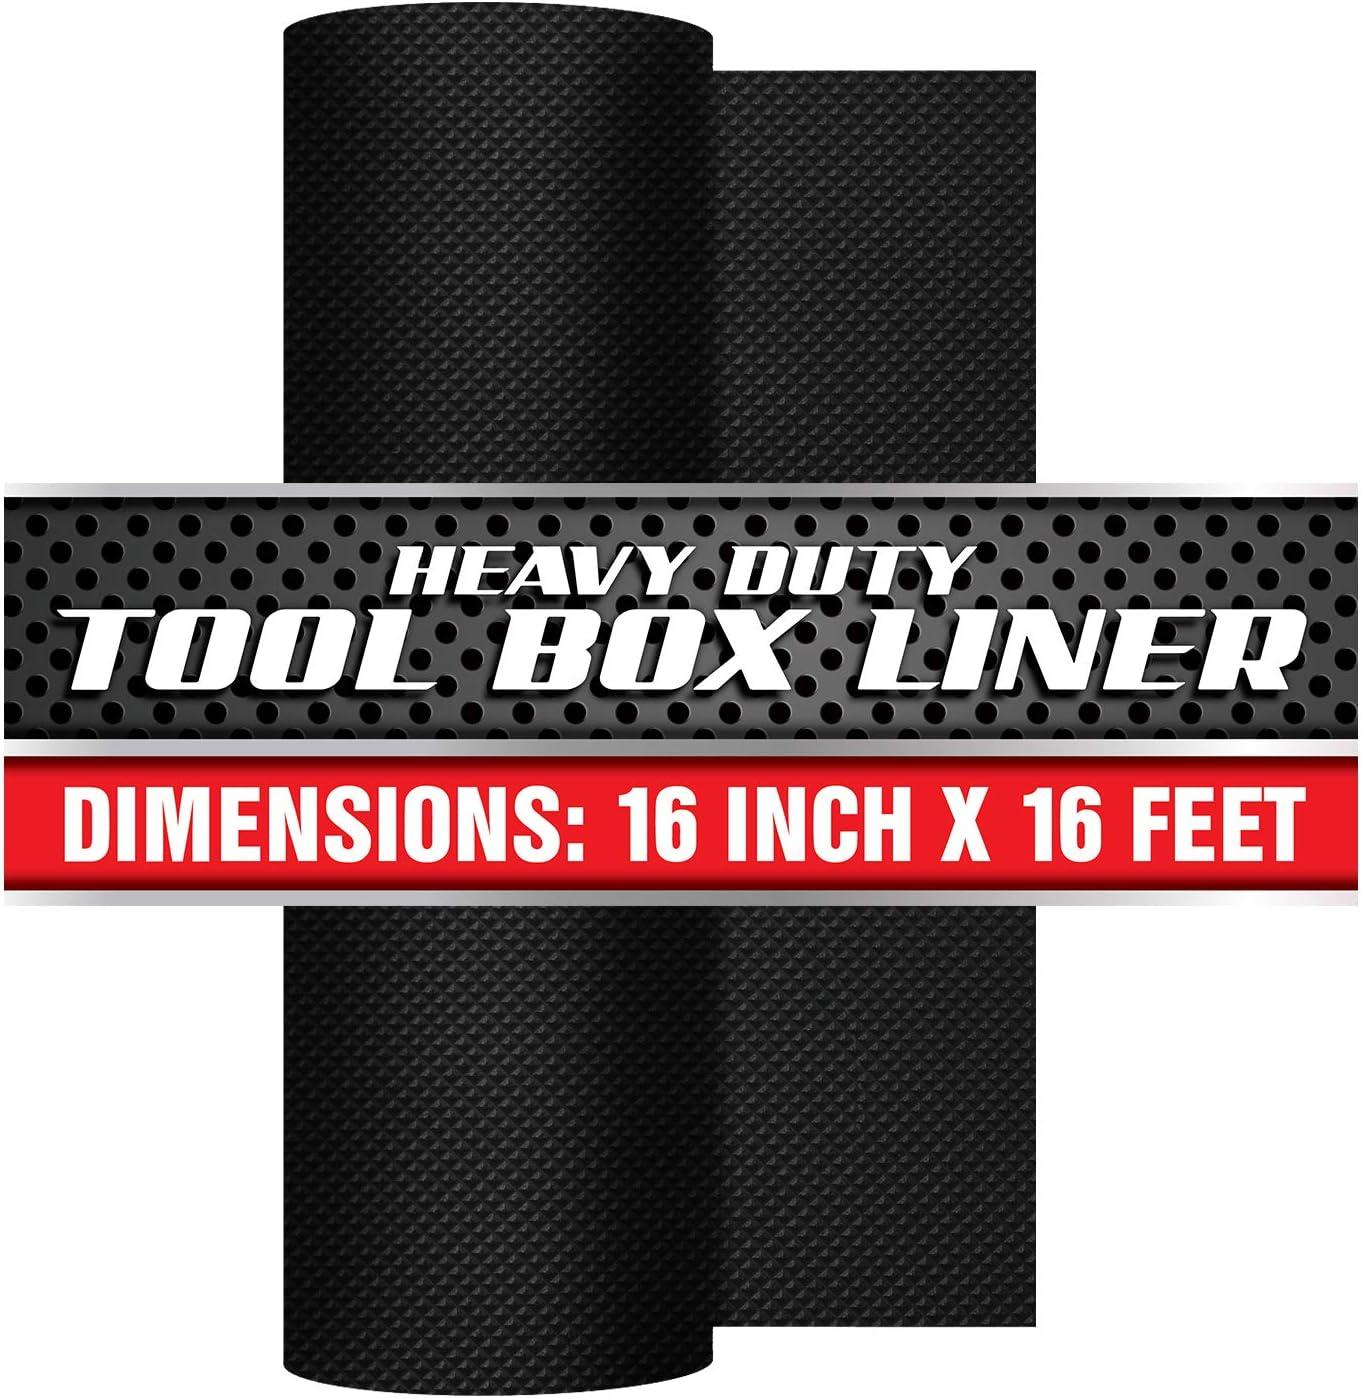 "Precision Defined Professional Grade Tool Box Liner, 16"" x 16 ft, Black | Non-Slip Thick Cabinet Shelf Liner"